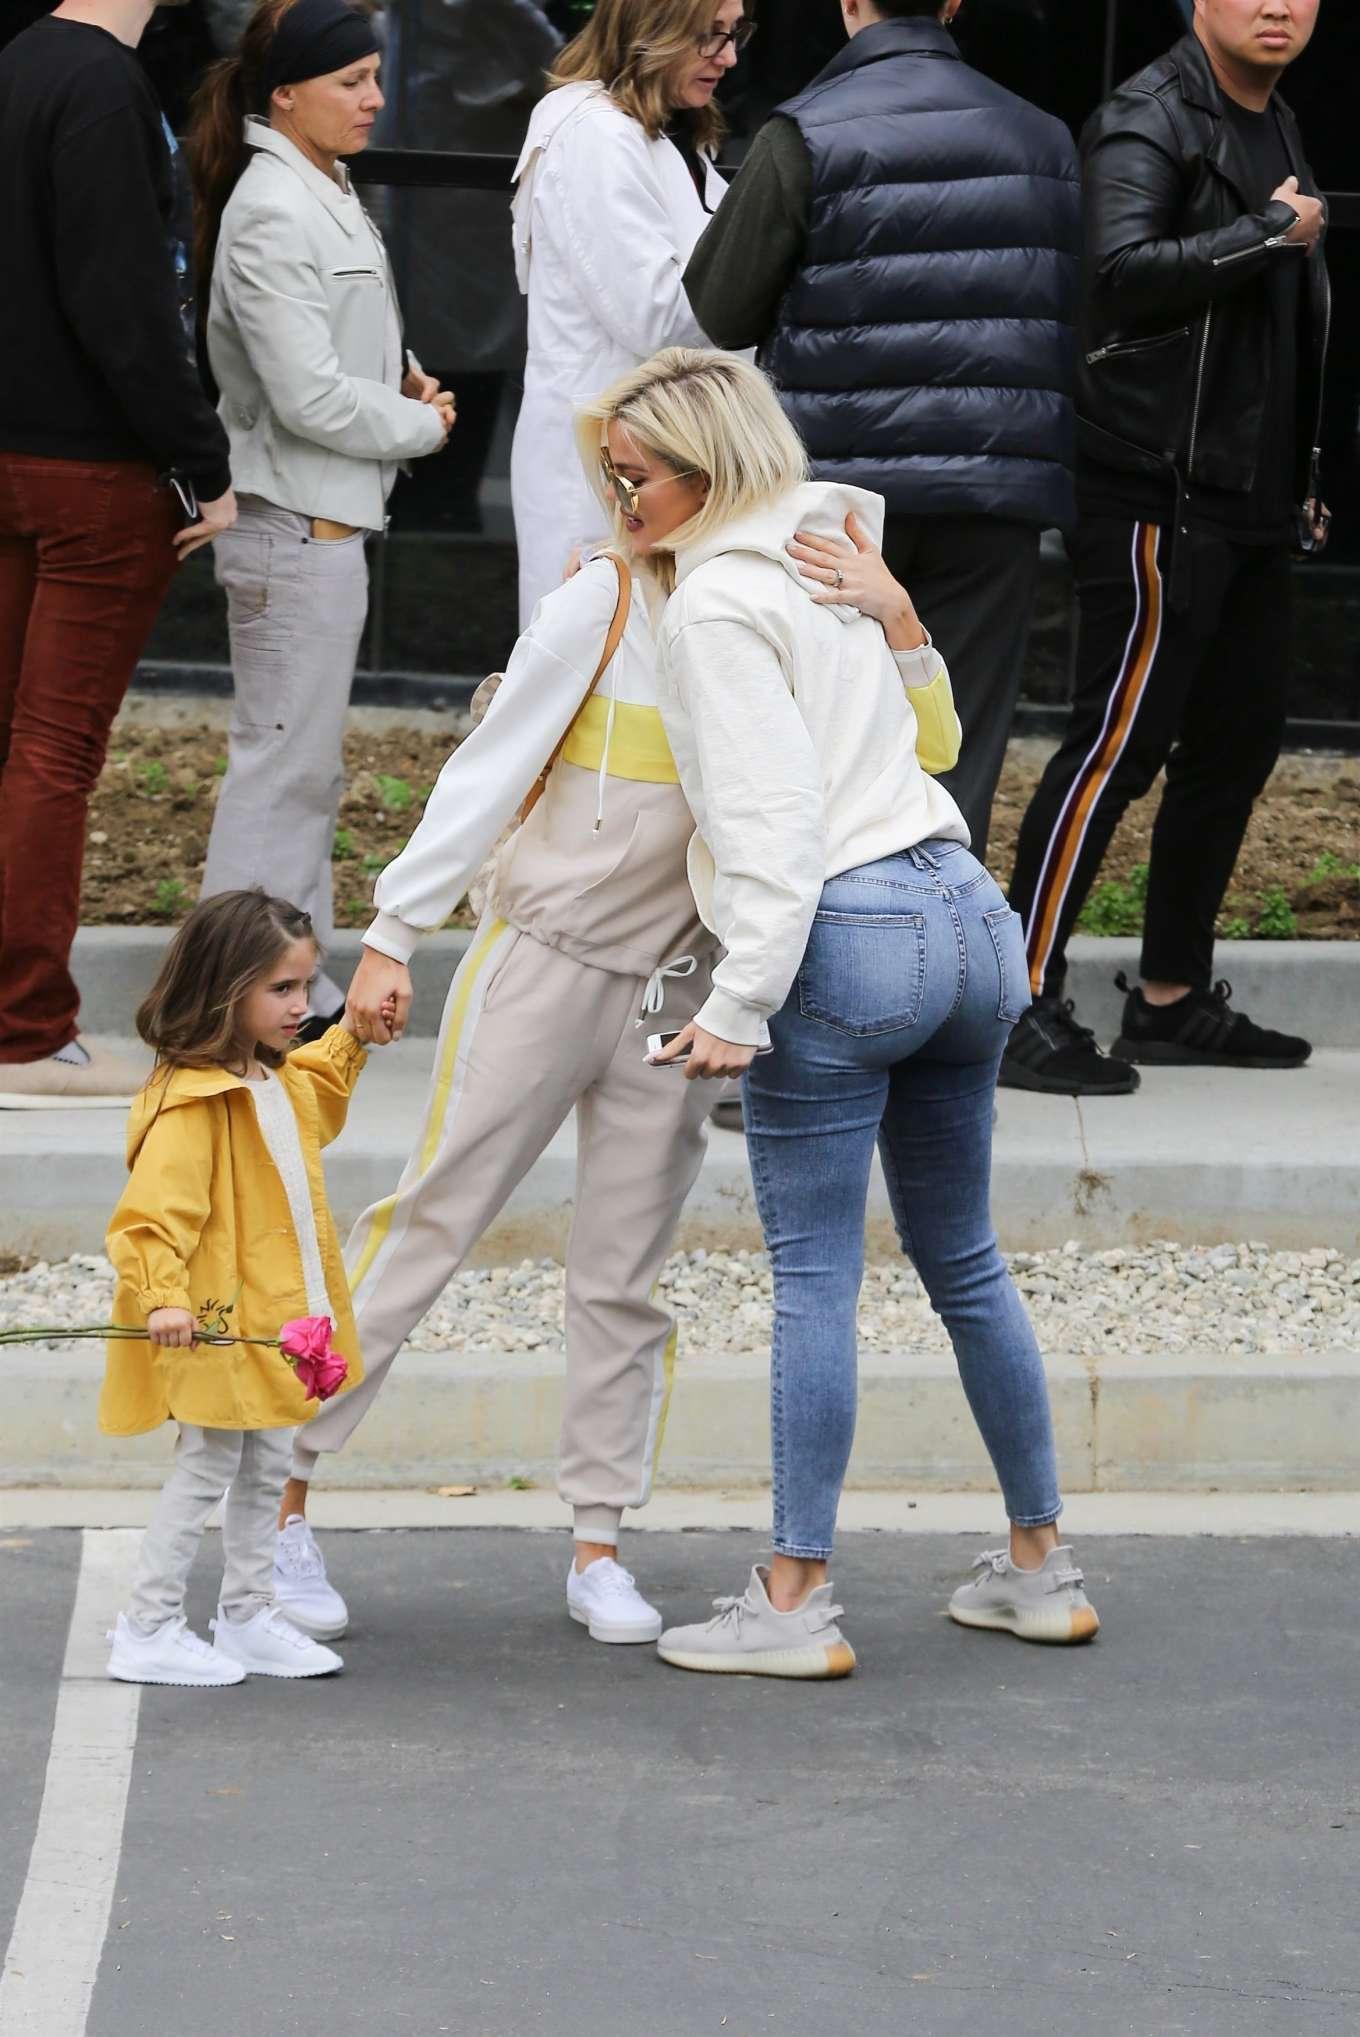 Khloe Kardashian 2019 : Khloe Kardashian at Kanye Wests Sunday church services-01